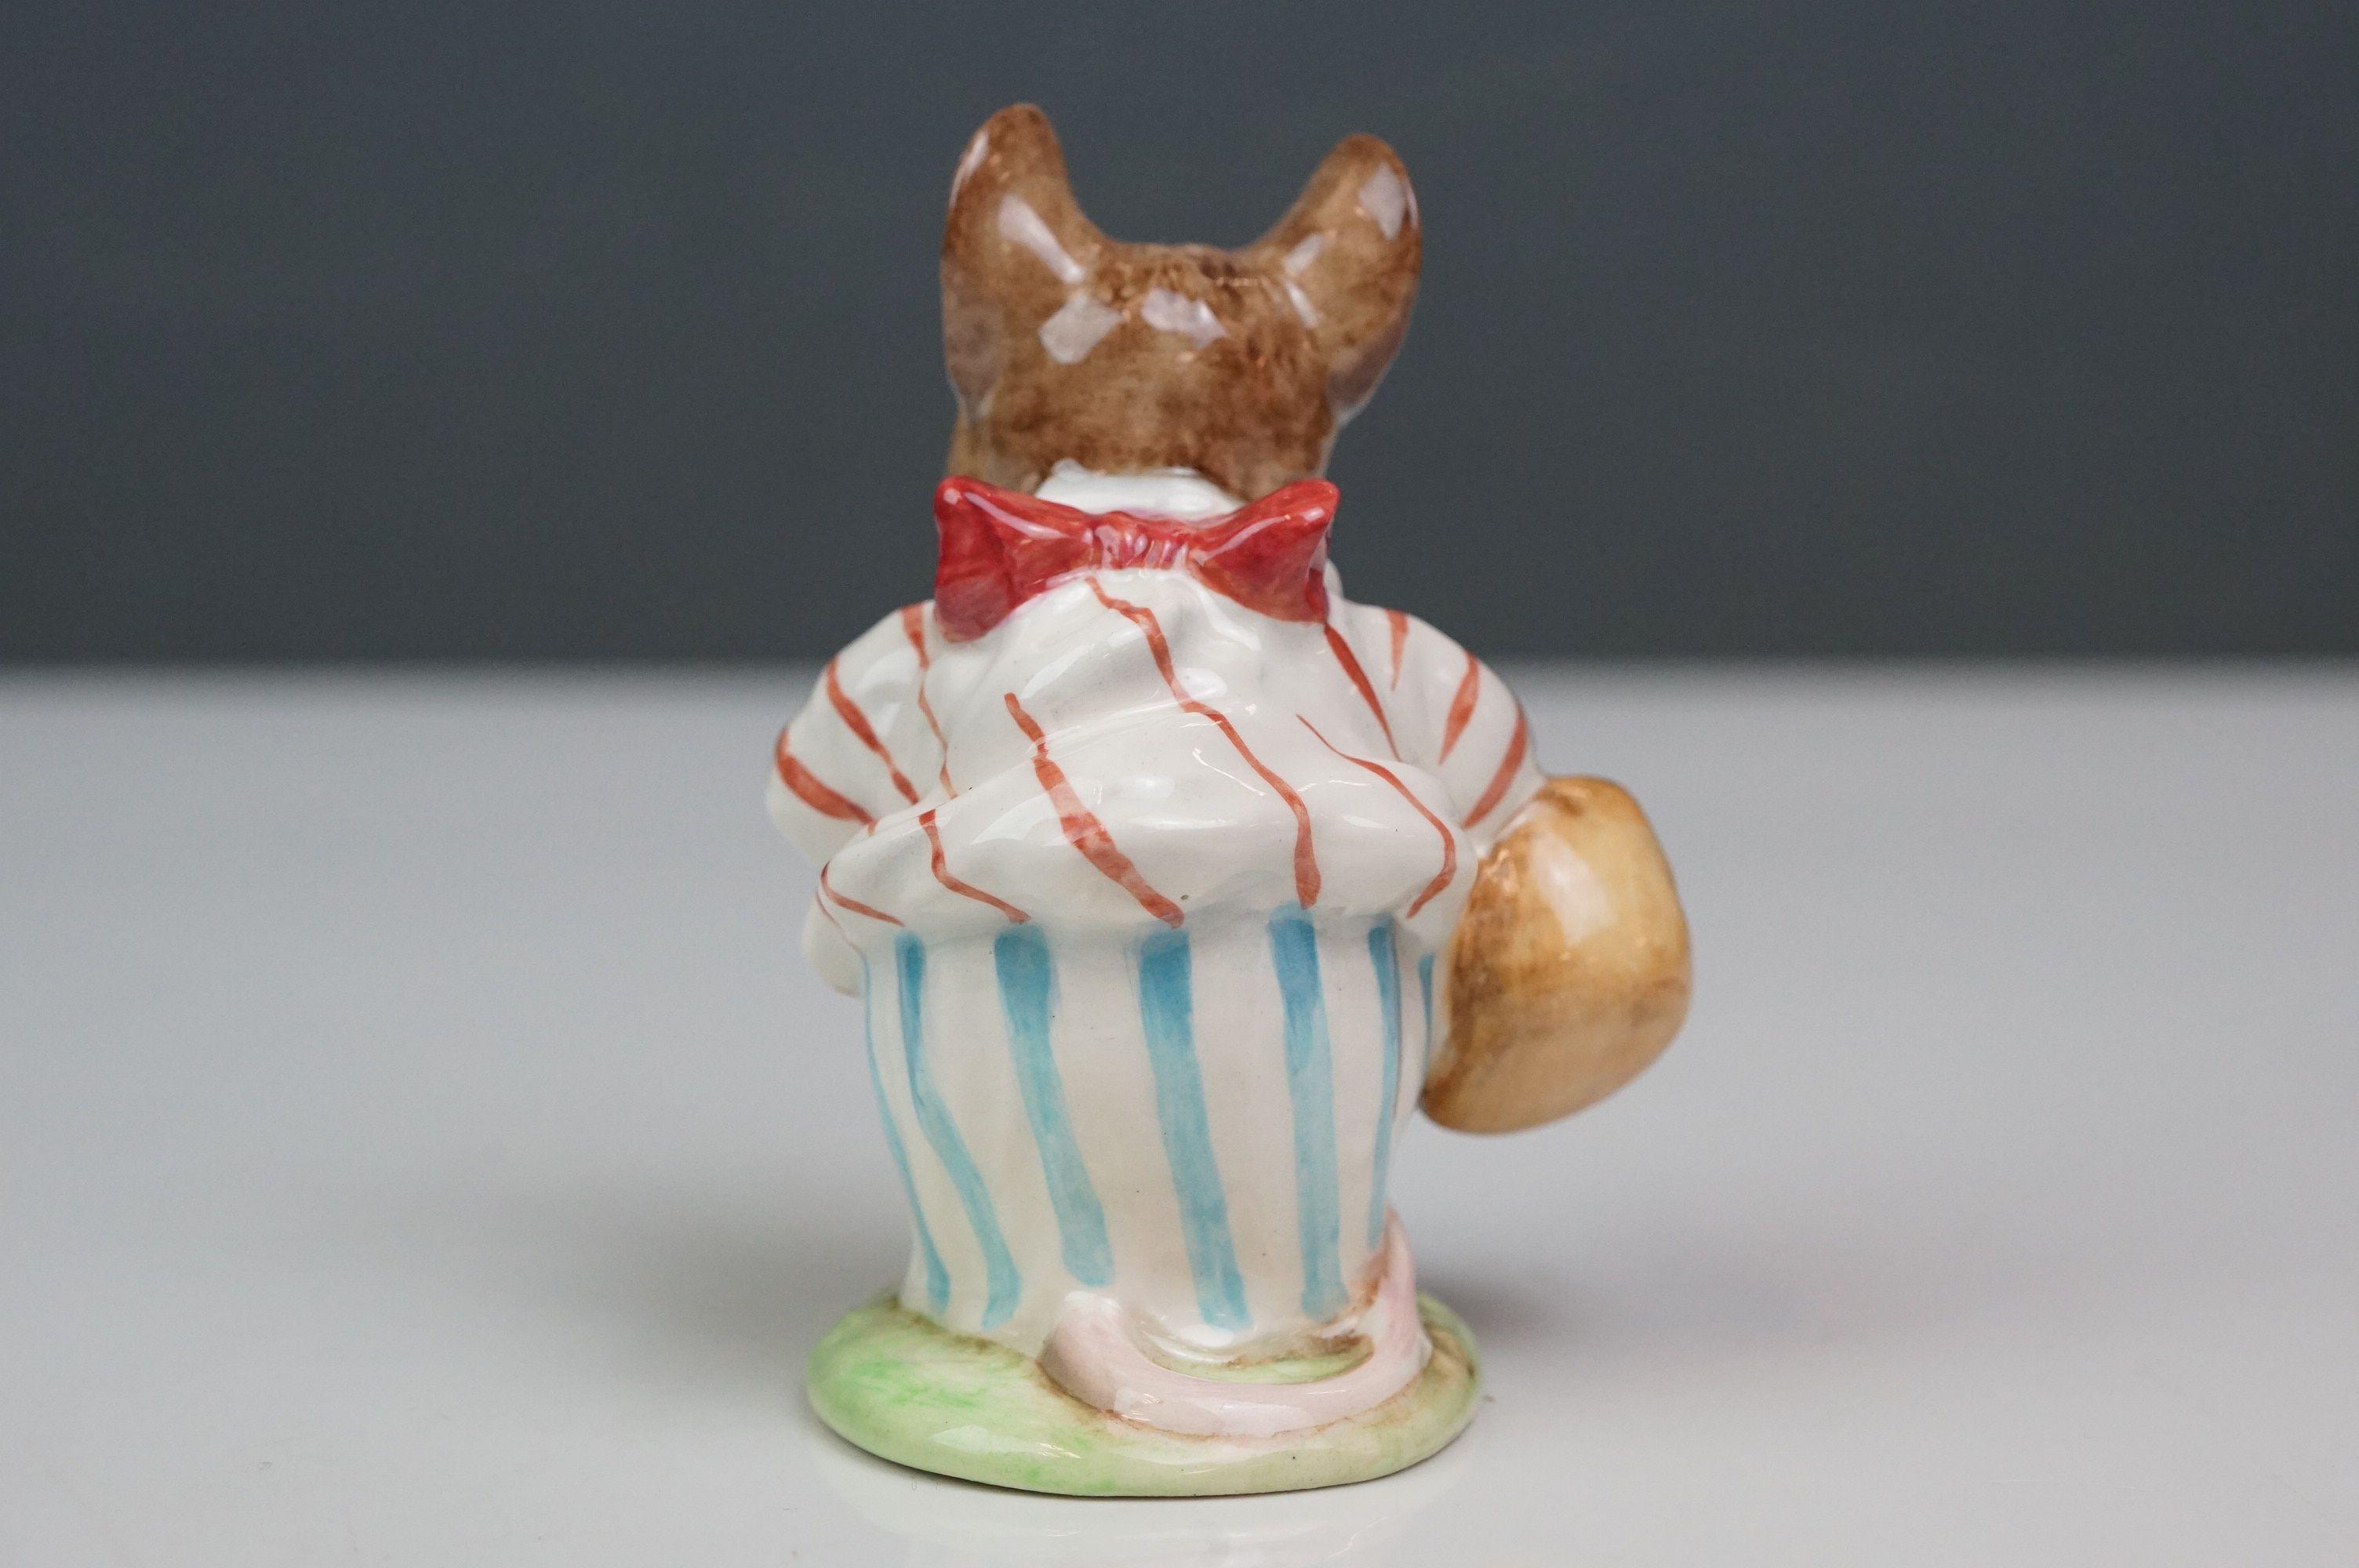 Beswick Beatrix Potter's Mrs Tittlemouse, style one, BP 1A No. 1103 - Image 4 of 5